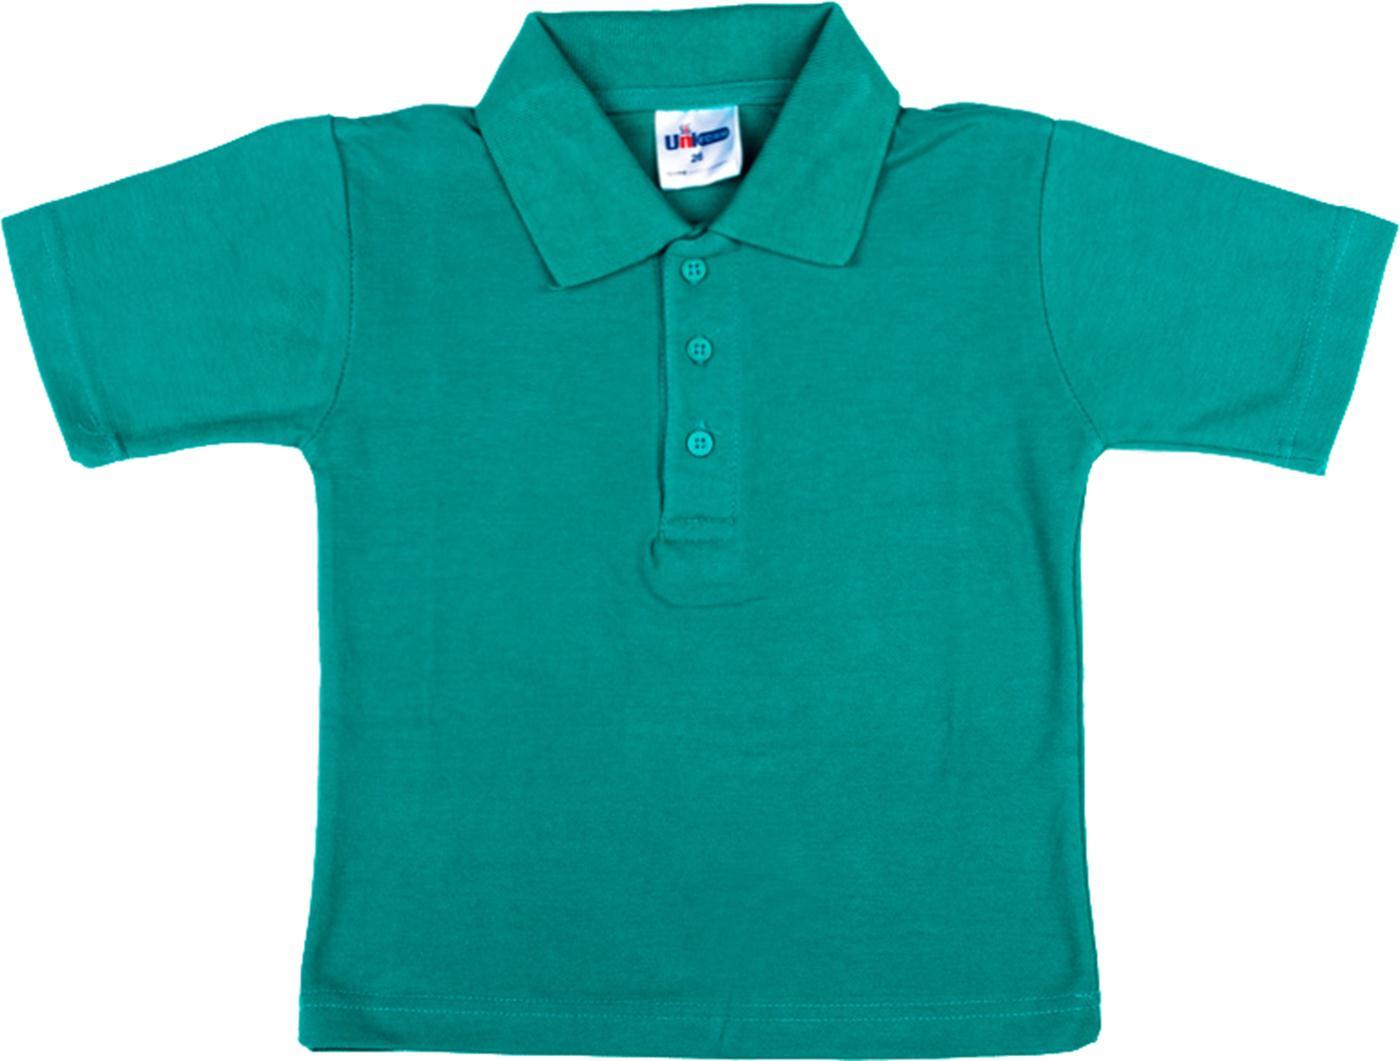 New-School-Uniform-Pol...